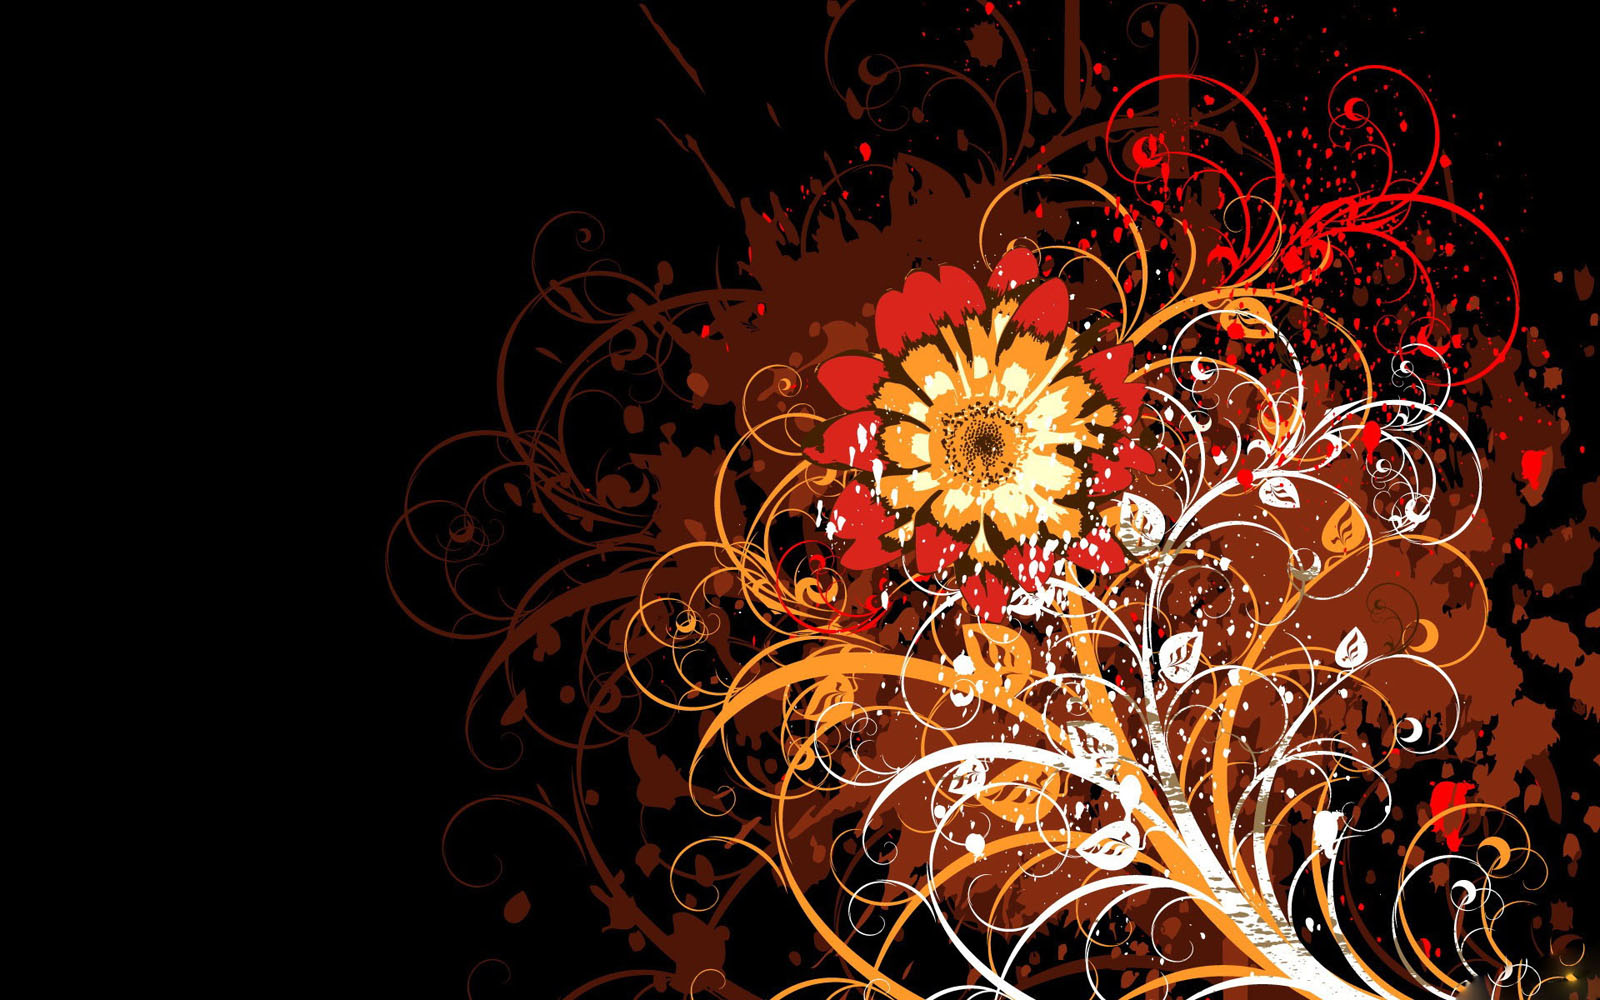 http://4.bp.blogspot.com/-YRtsEXtUXyM/T6fe8__Z57I/AAAAAAAACgc/U8uDPl5m6fs/s1600/Vector+Flowers+Wallpapers.jpg